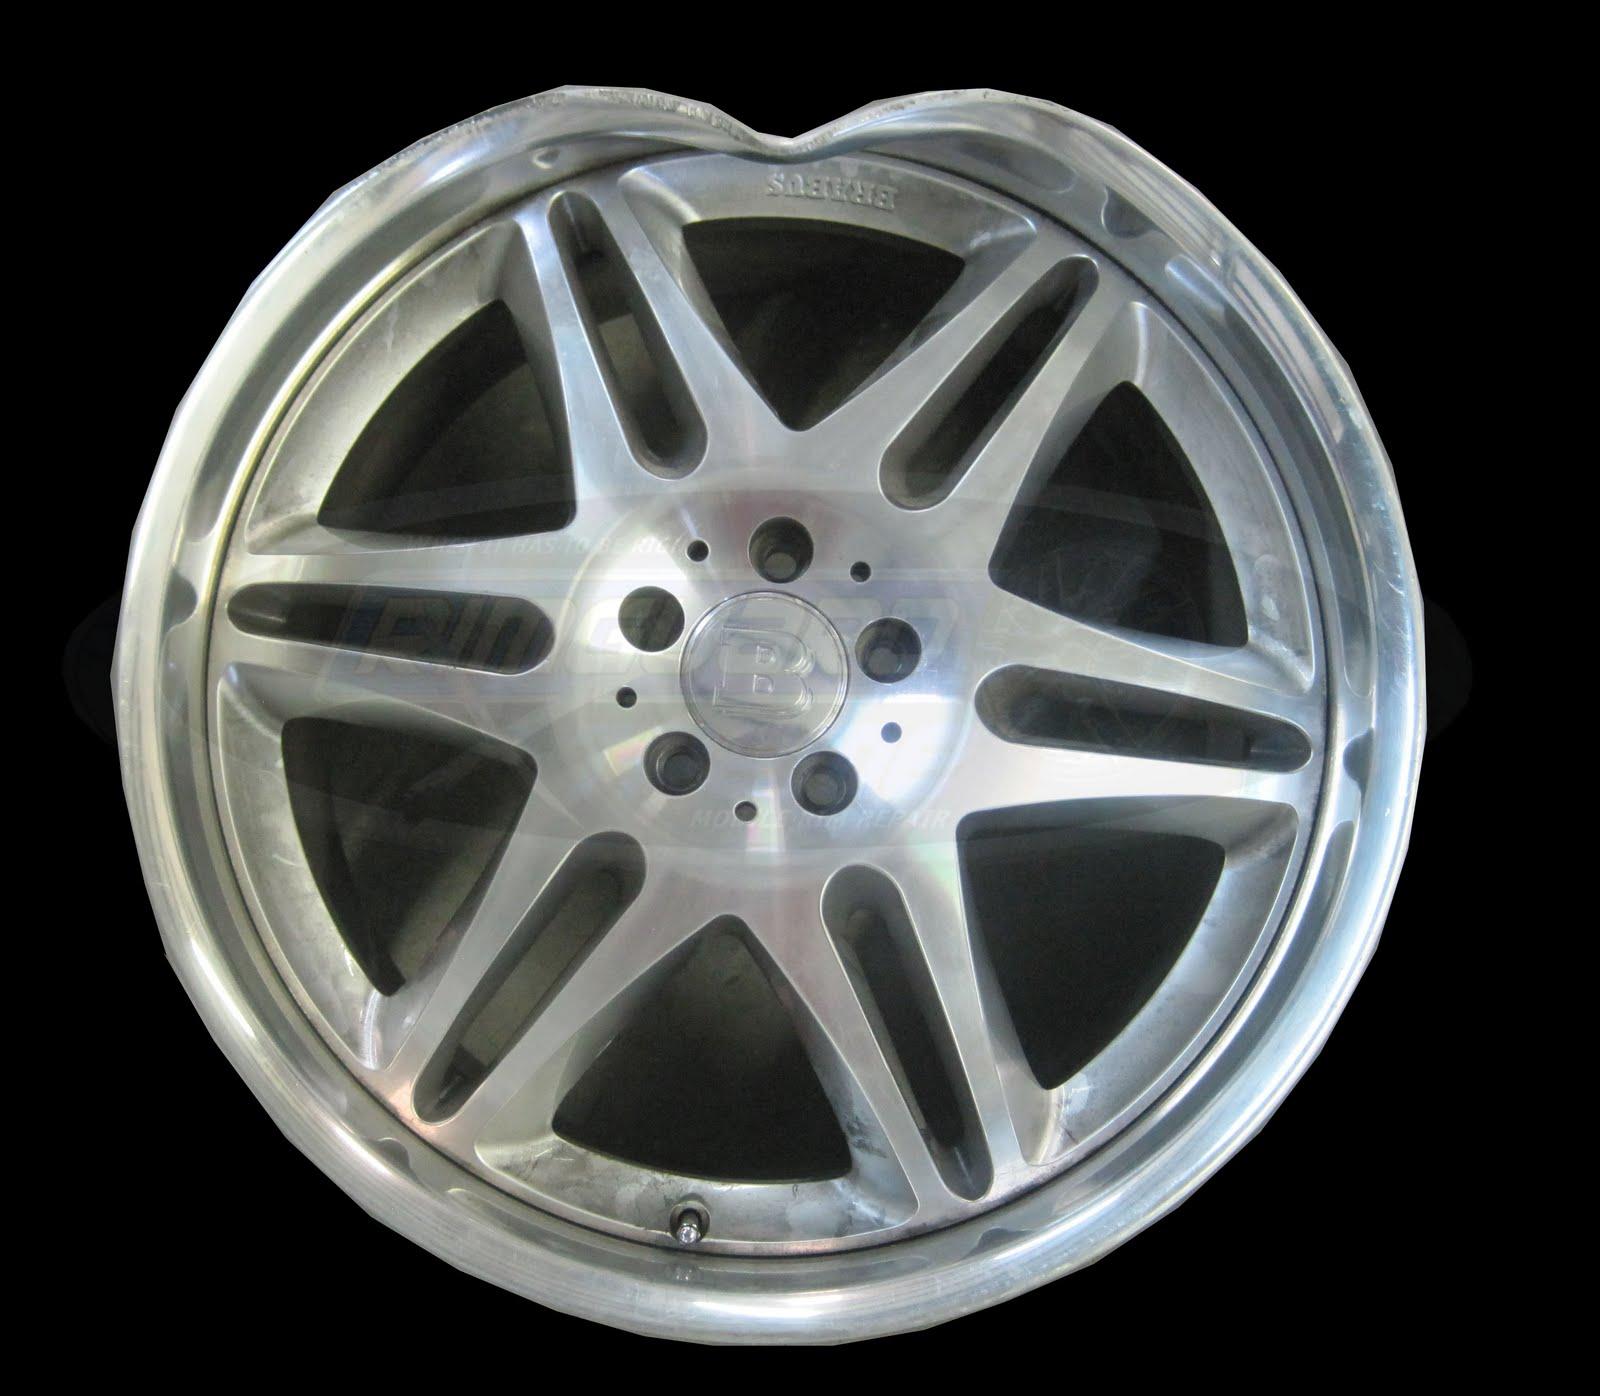 Honda Wilmington Nc >> Alloy Mobile Wheel Rim Repair - RimGuard Xtreme, Inc: Got